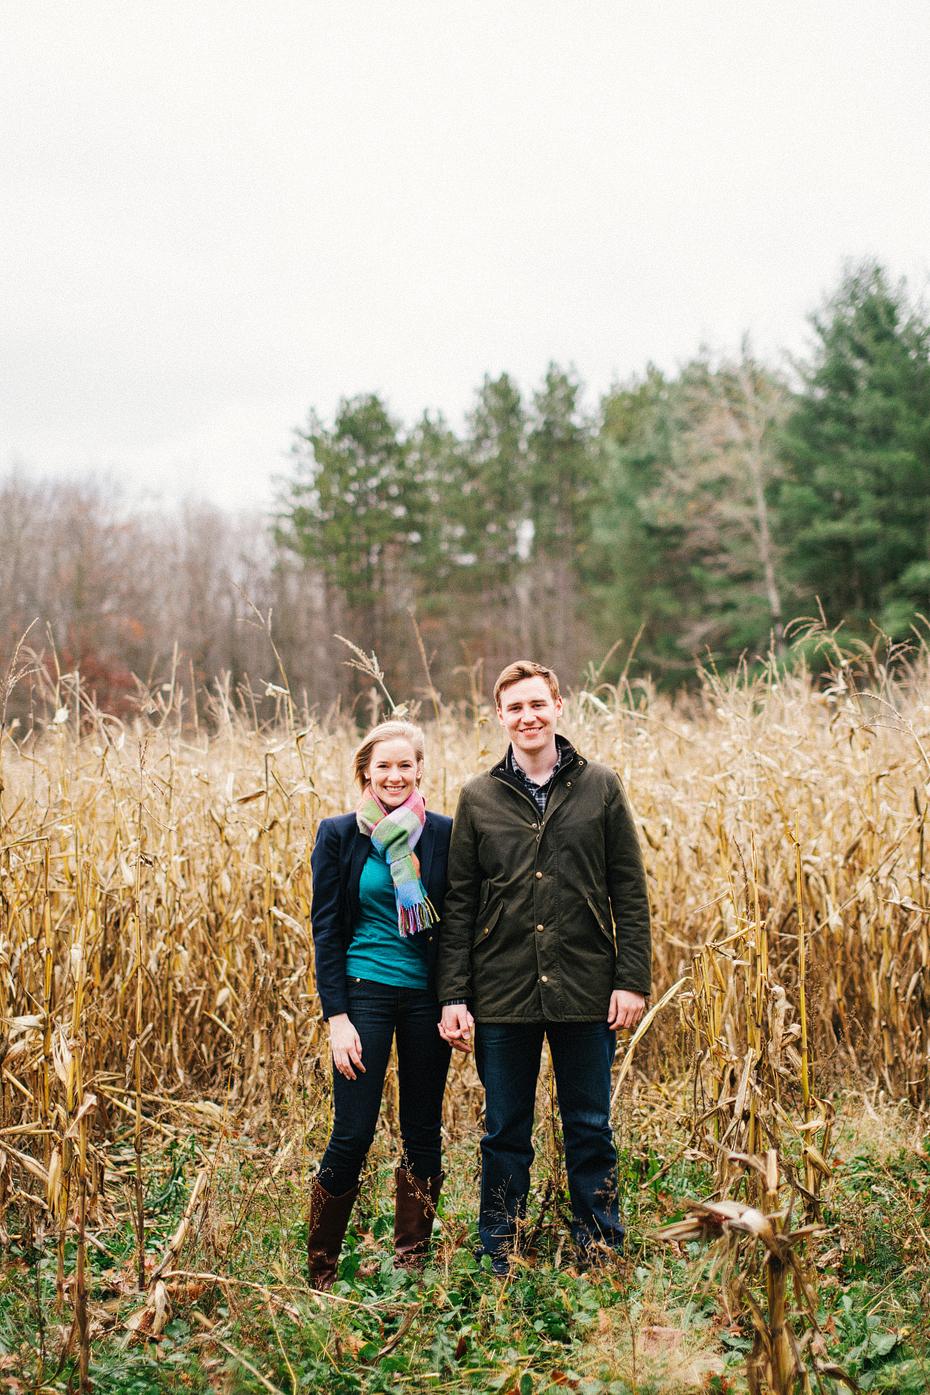 Heather Jowett Ann Arbor Detroit Fine Art Wedding Photographer Woods Engagement Session